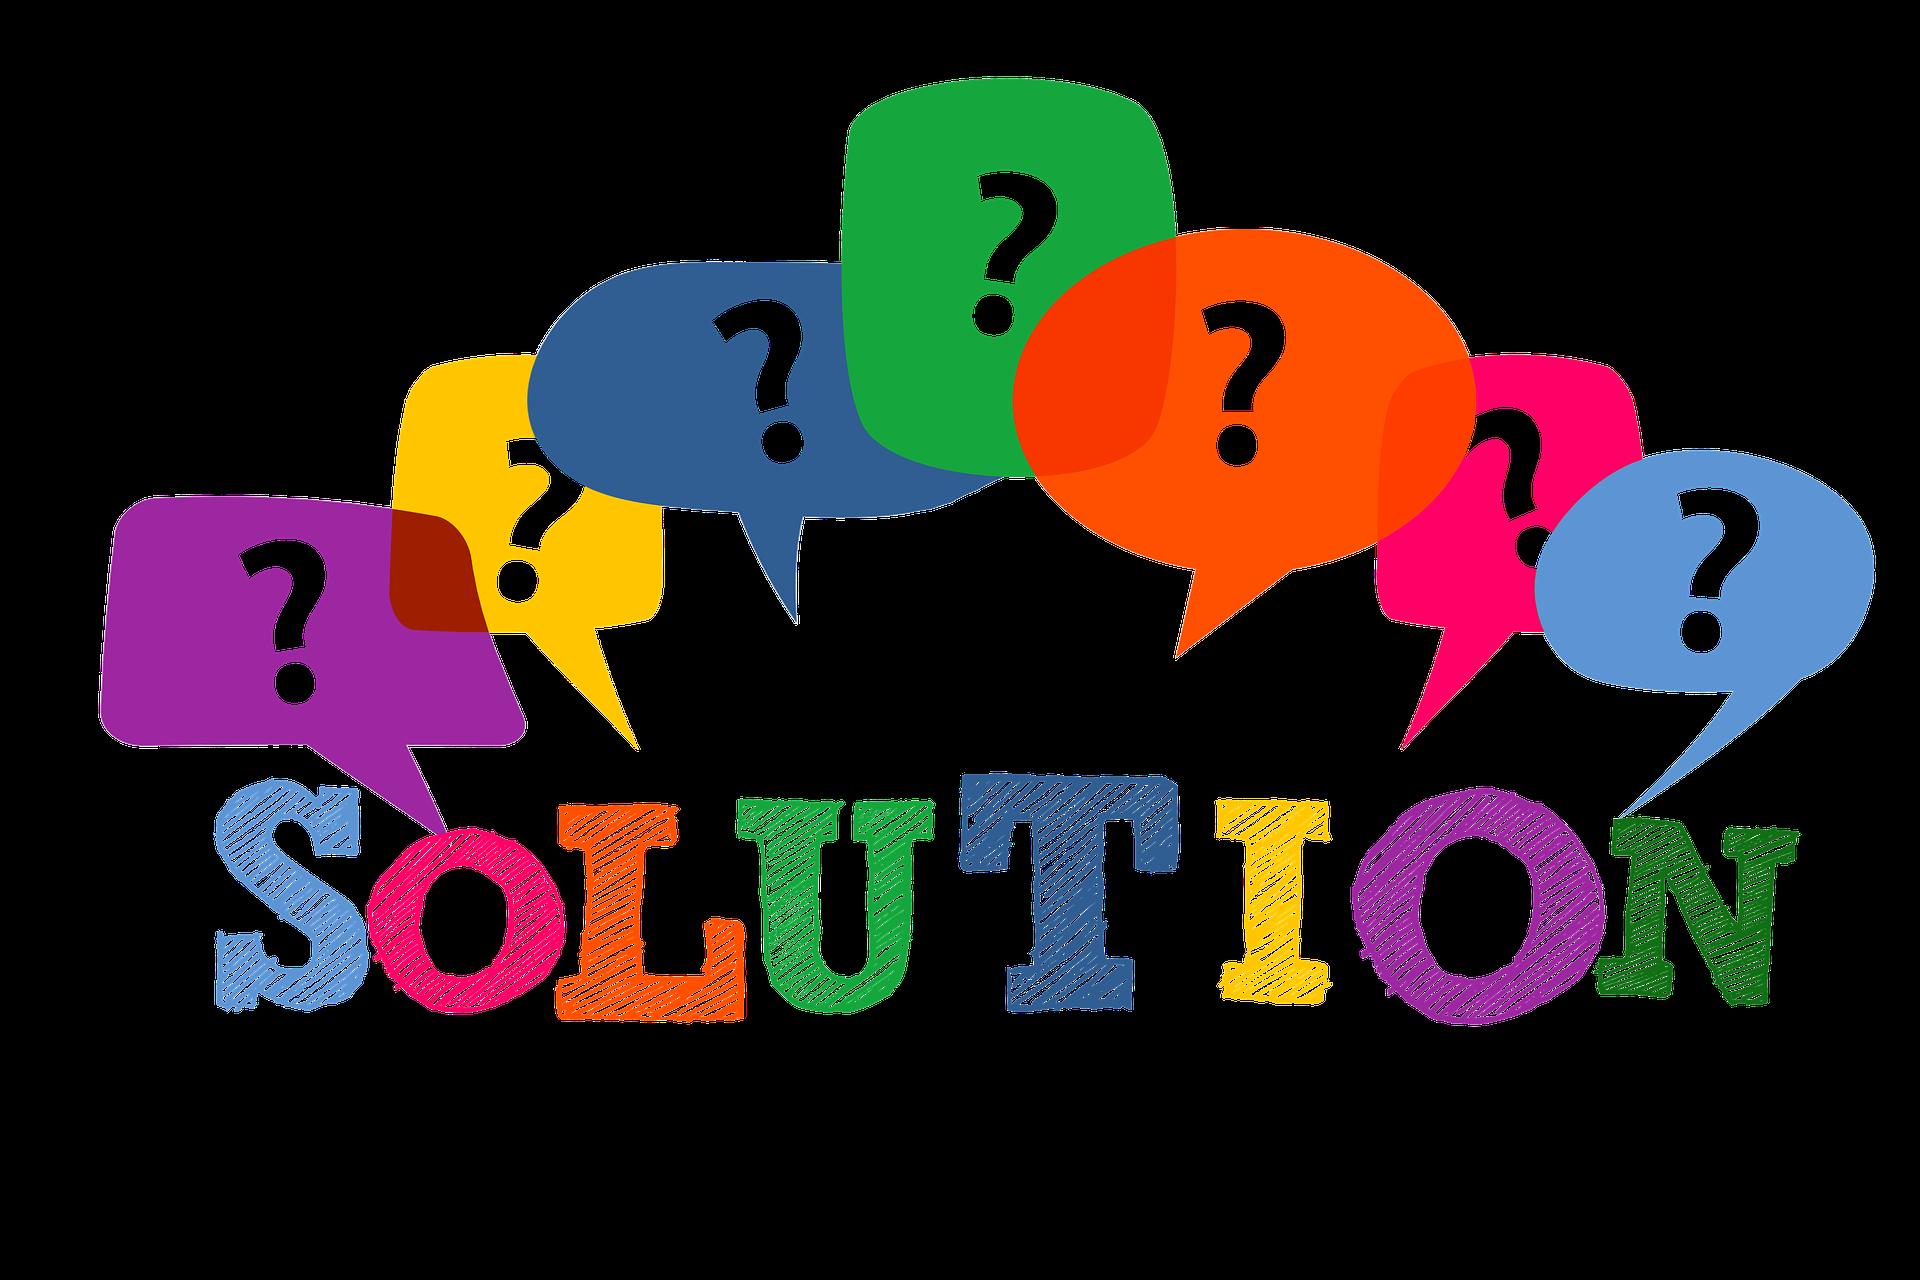 solution-3696900_1920